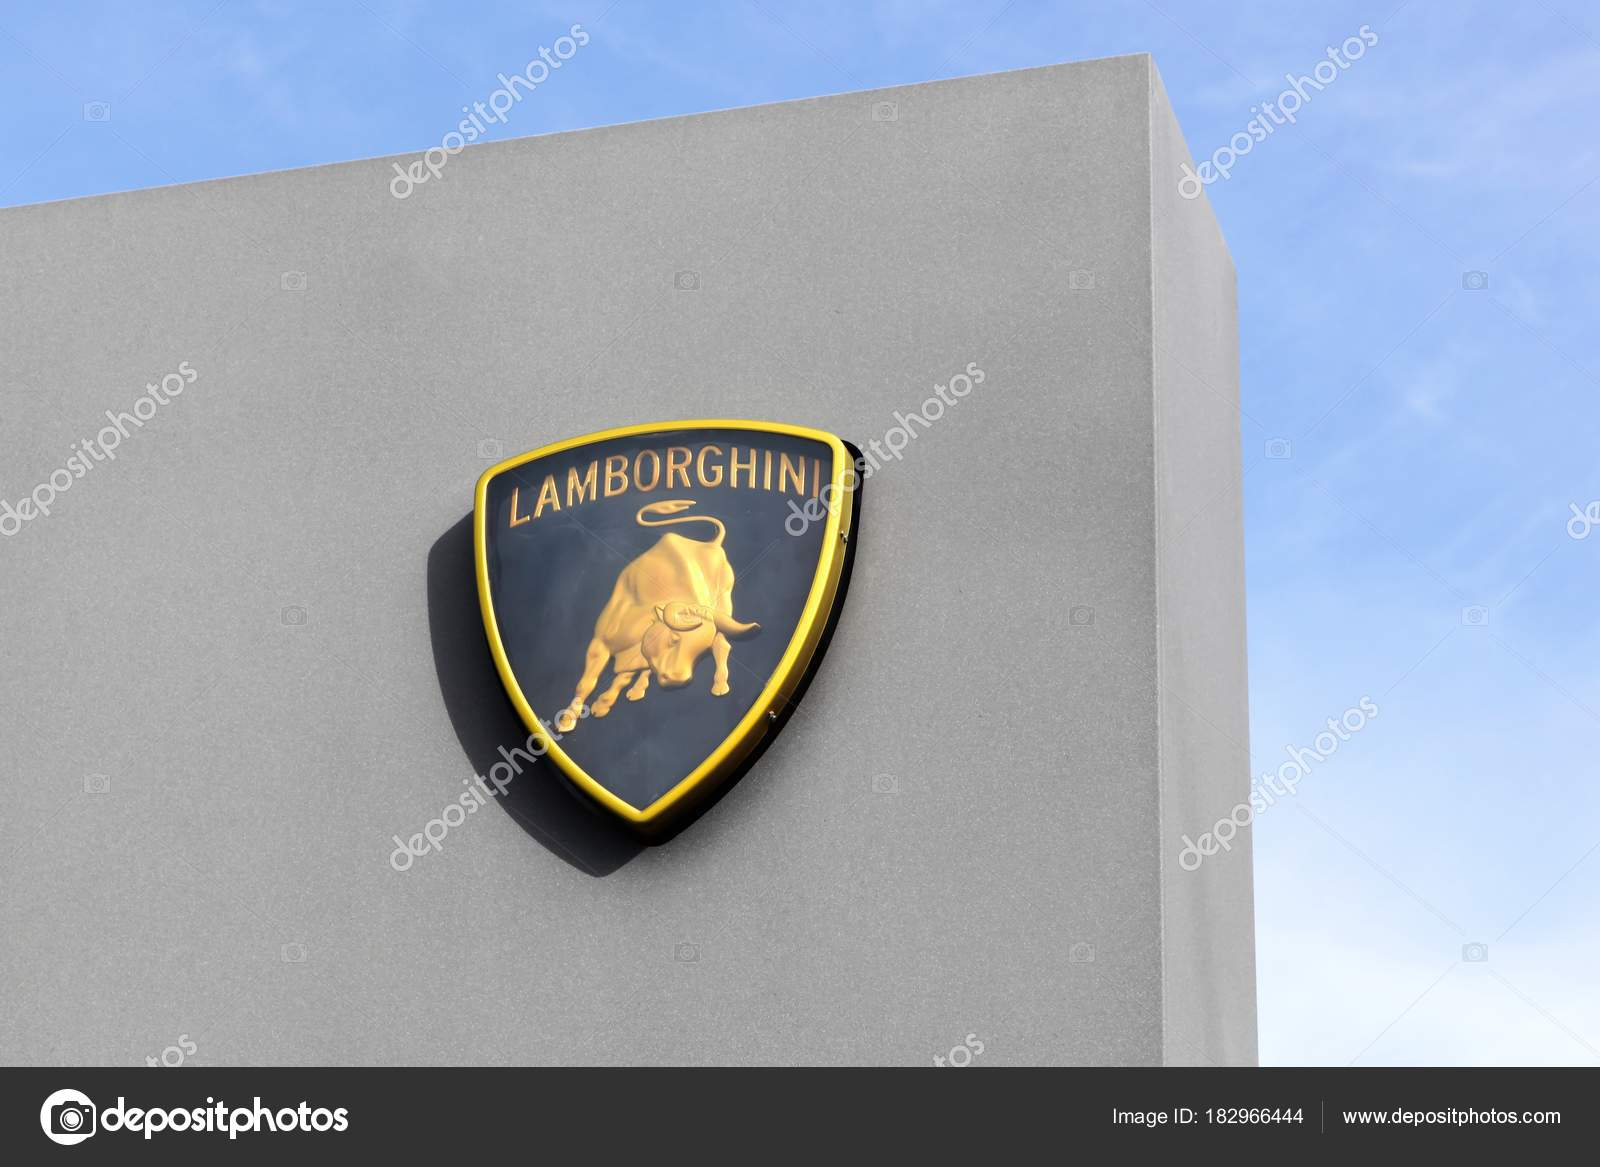 Dardilly Francia Febrero 2017 Logo Lamborghini Panel Lamborghini Una